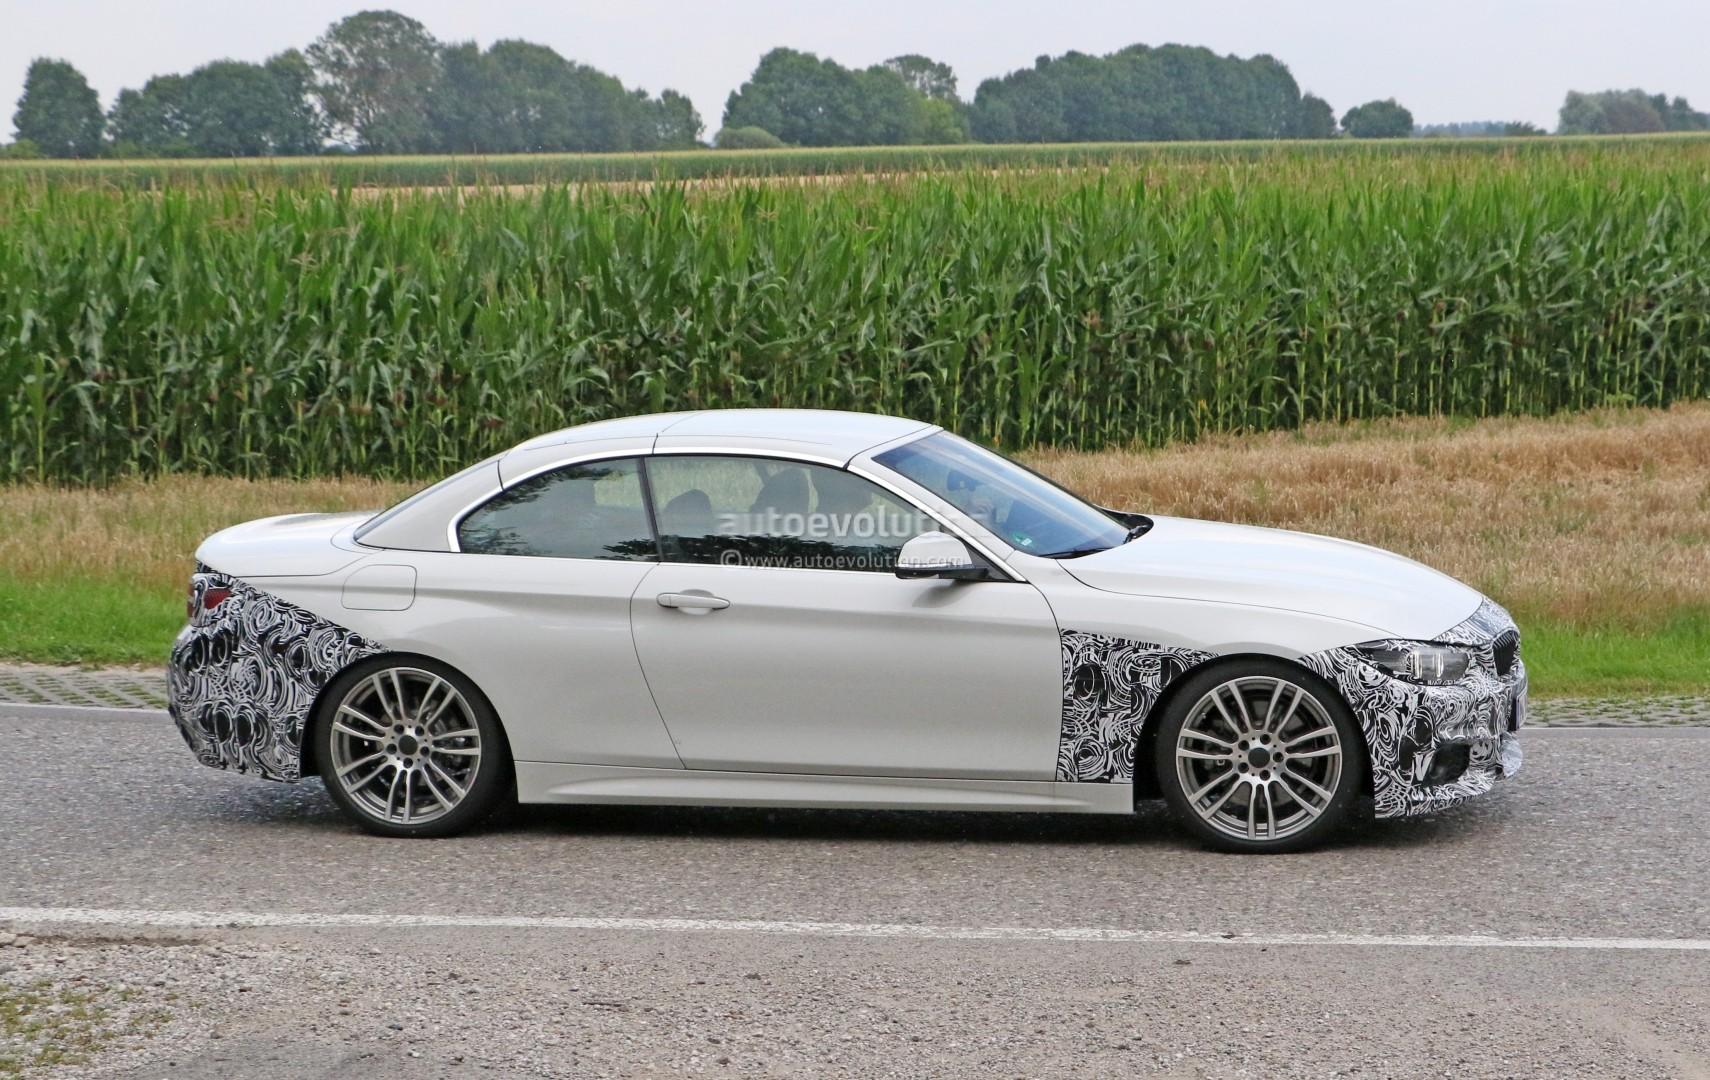 2018 BMW 4 Series Convertible Makes Spyshot Debut, Ready ...